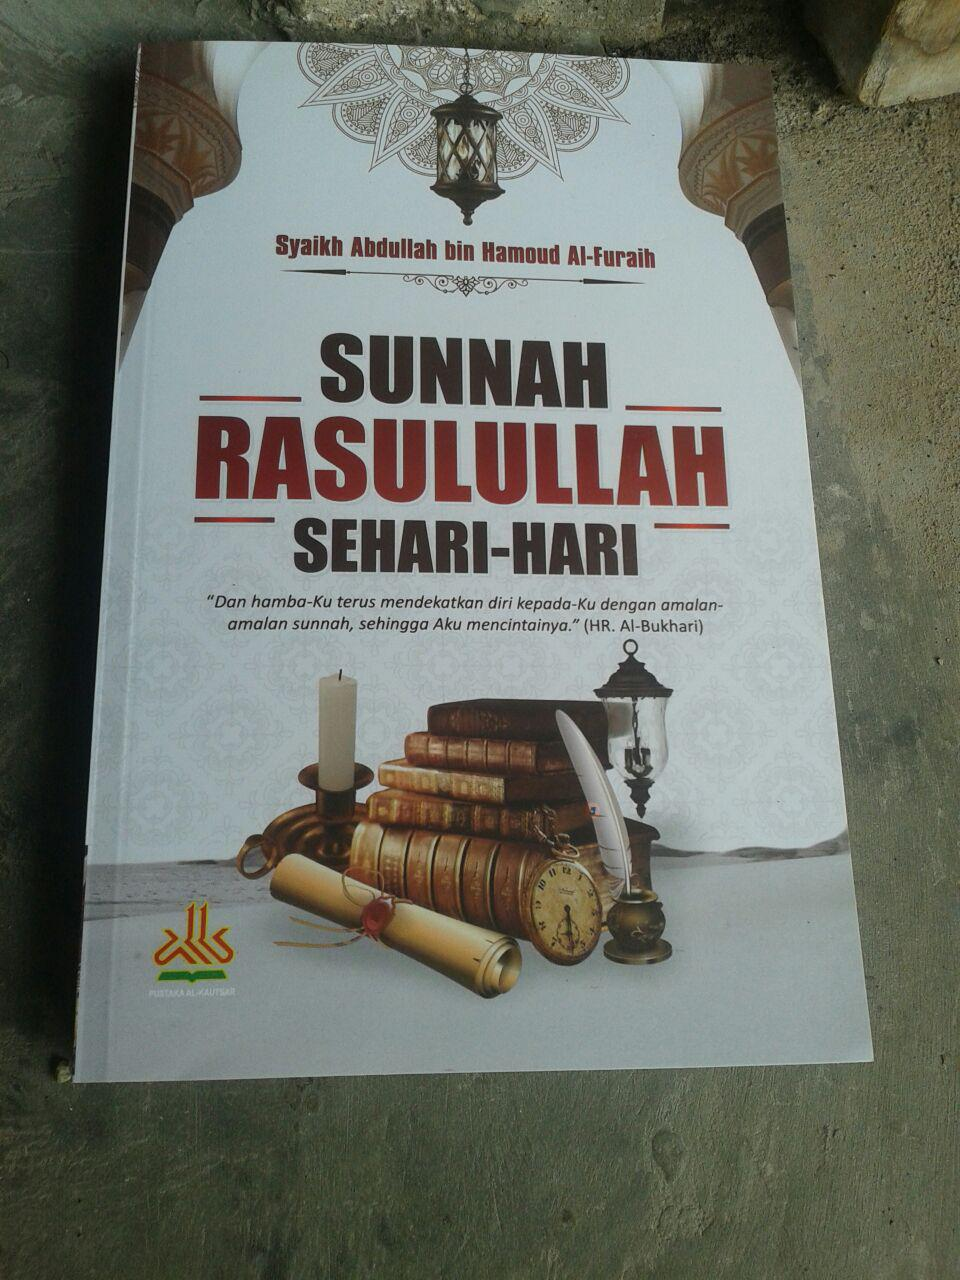 Buku Sunnah Rasulullah Sehari Hari cover 2